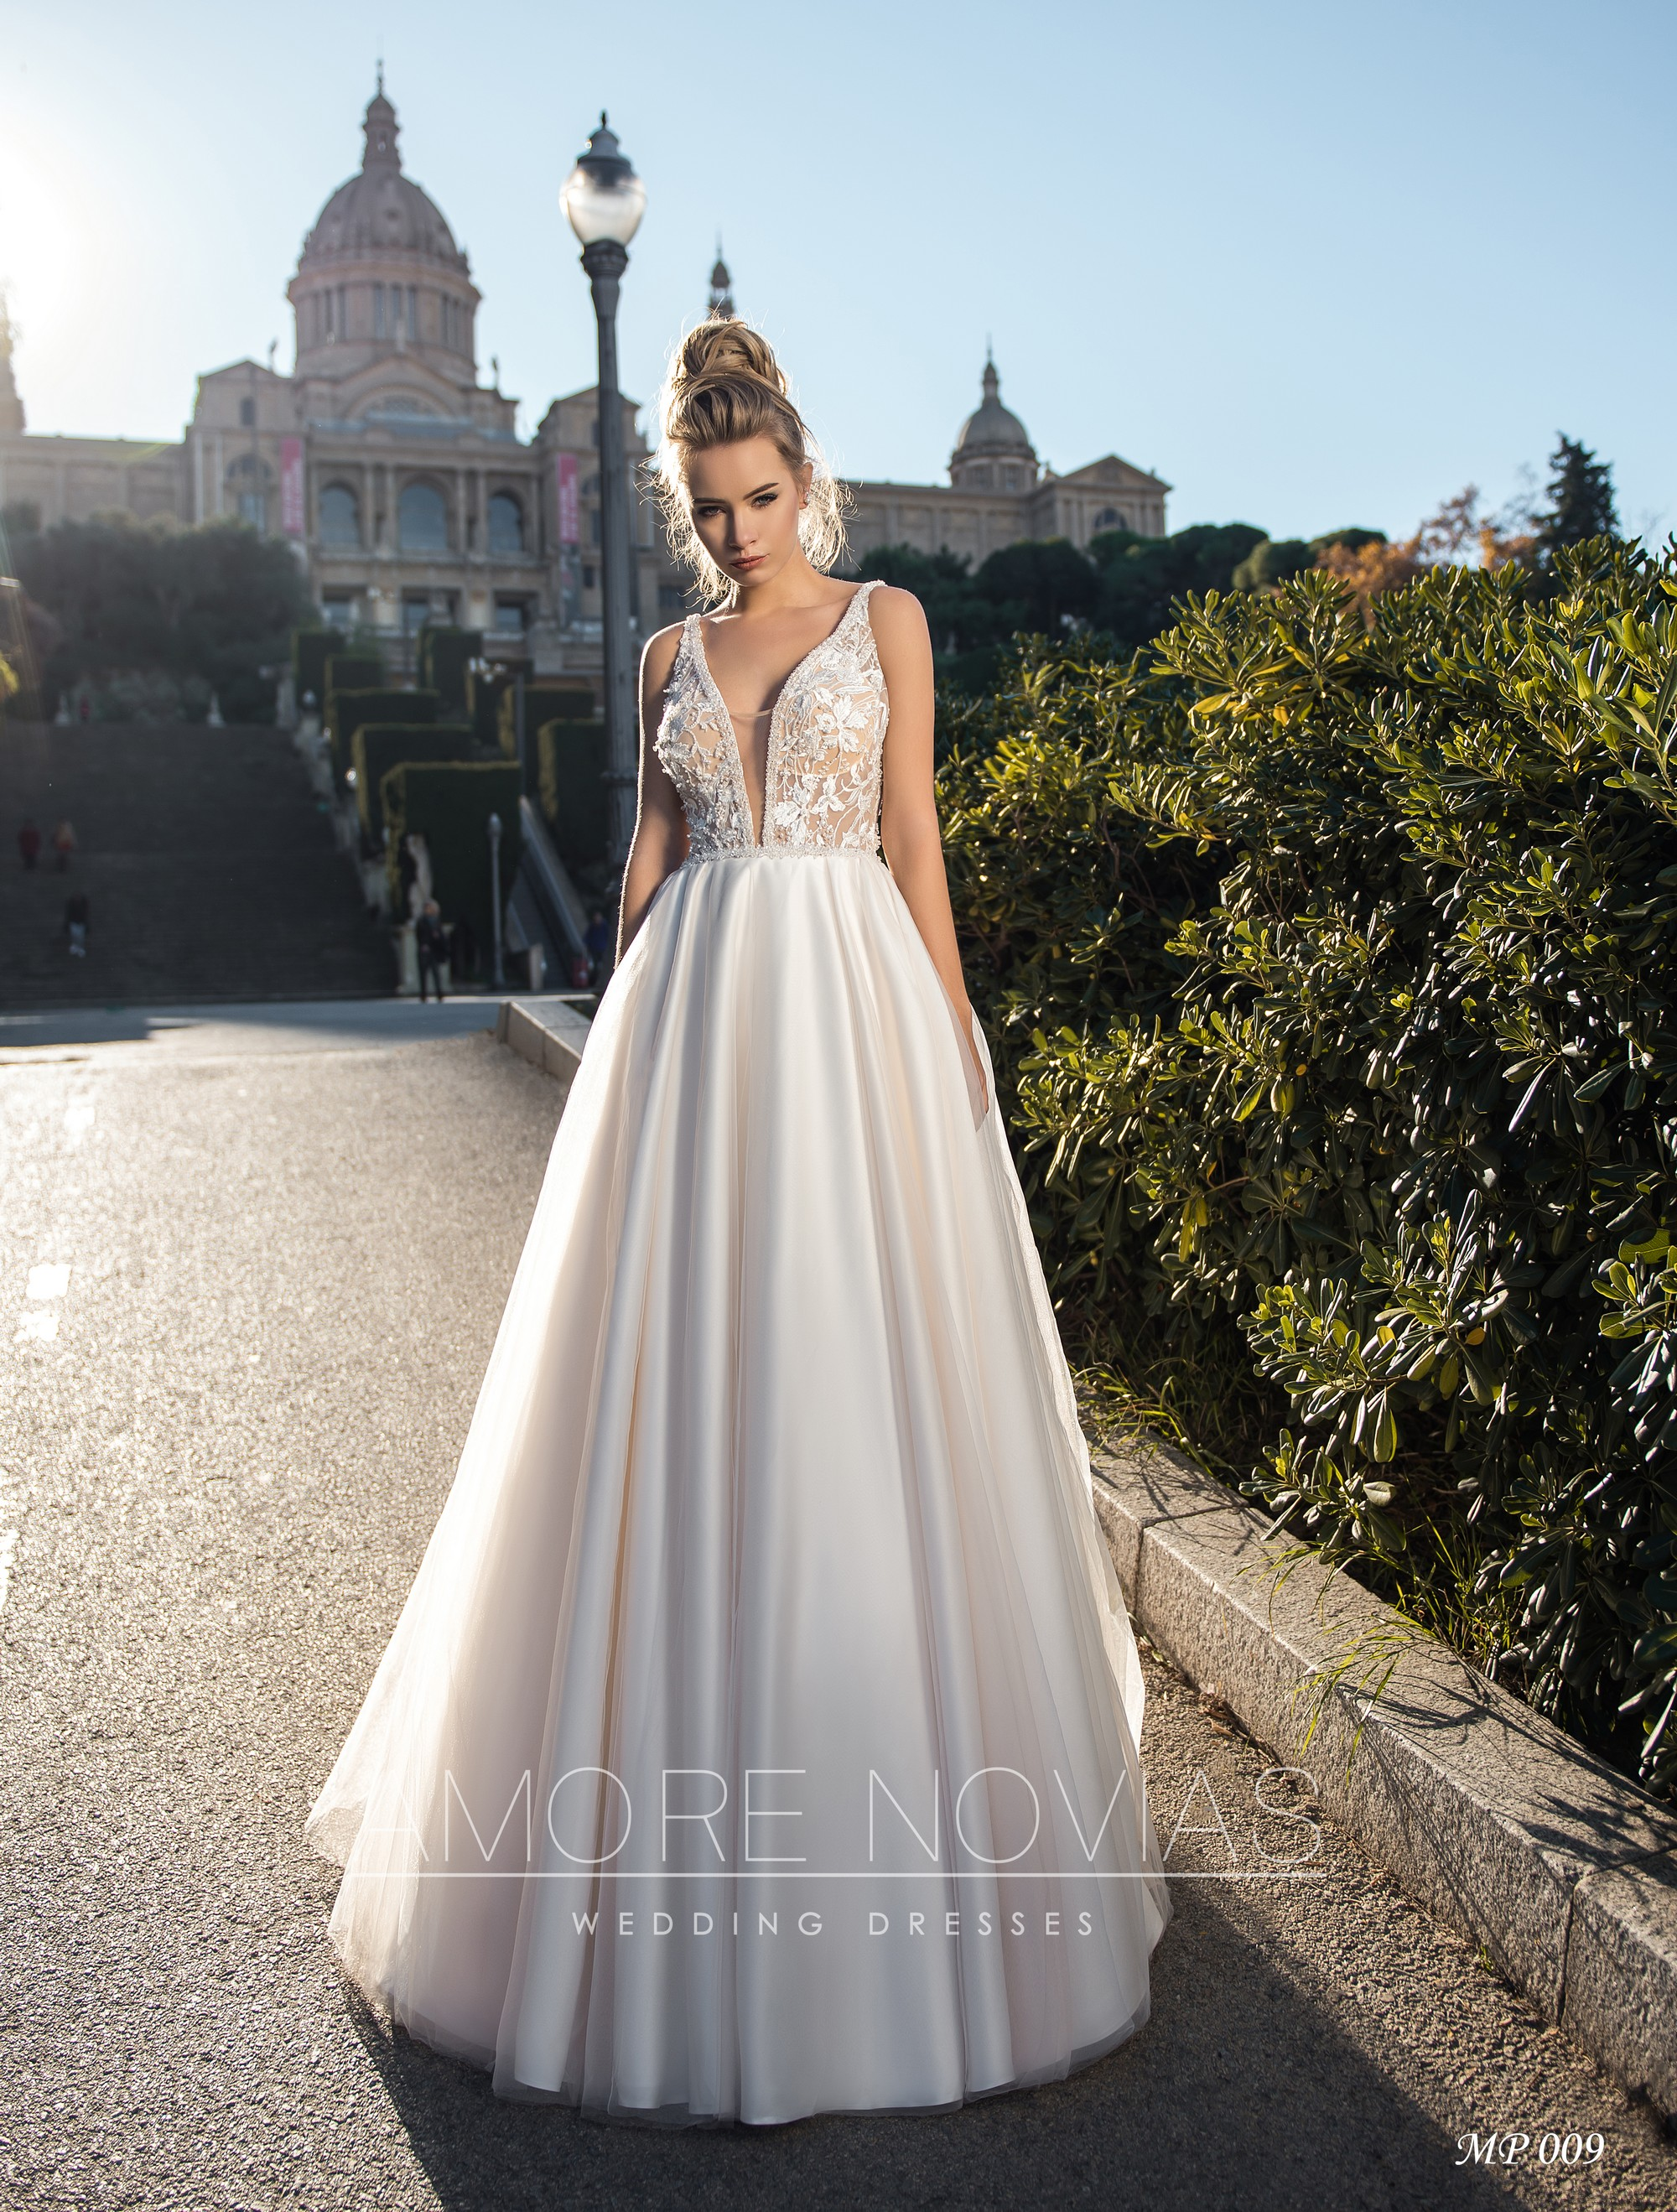 http://amore-novias.com/images/stories/virtuemart/product/mp-009--------(1).jpg